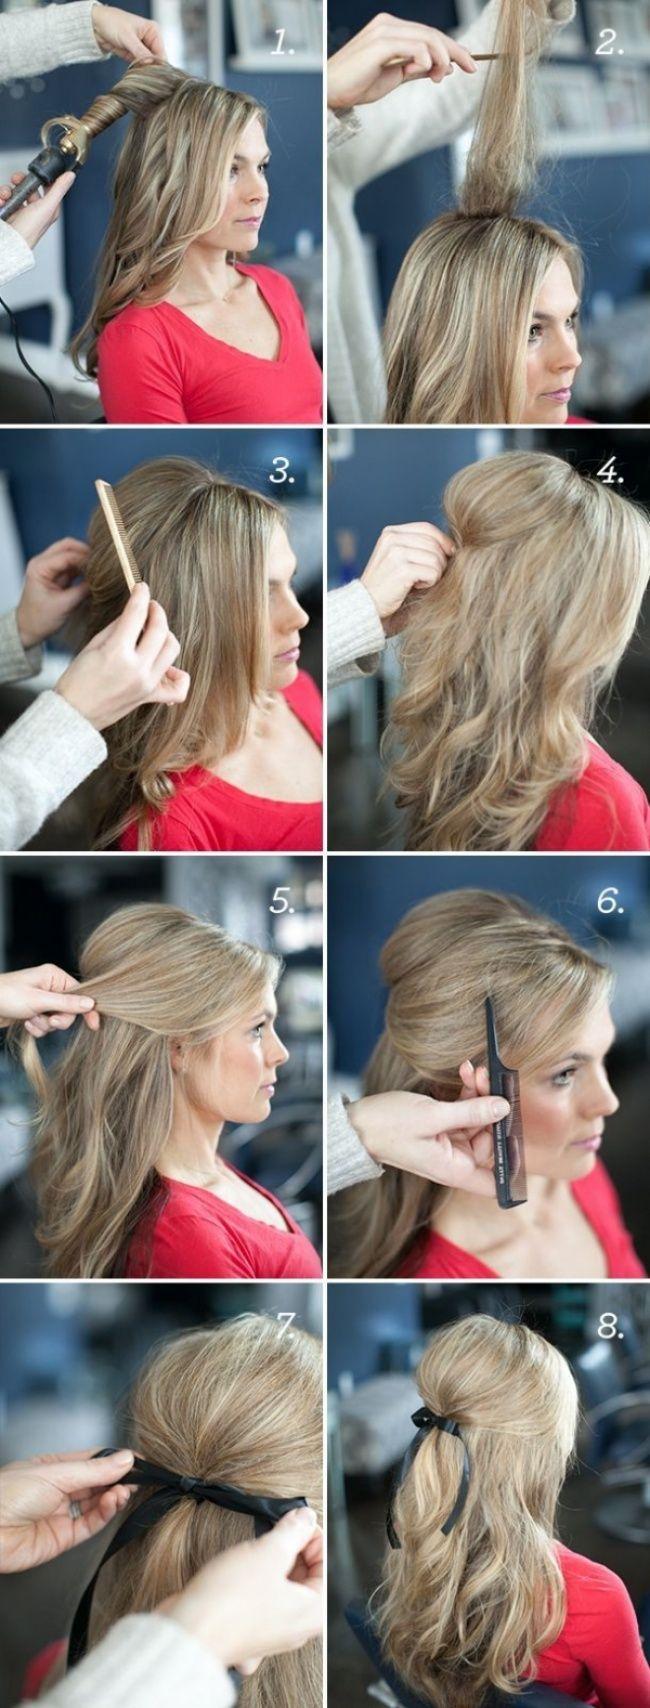 5065710-650-1449734639-fabulous-half-up-half-down-hairstyles-4